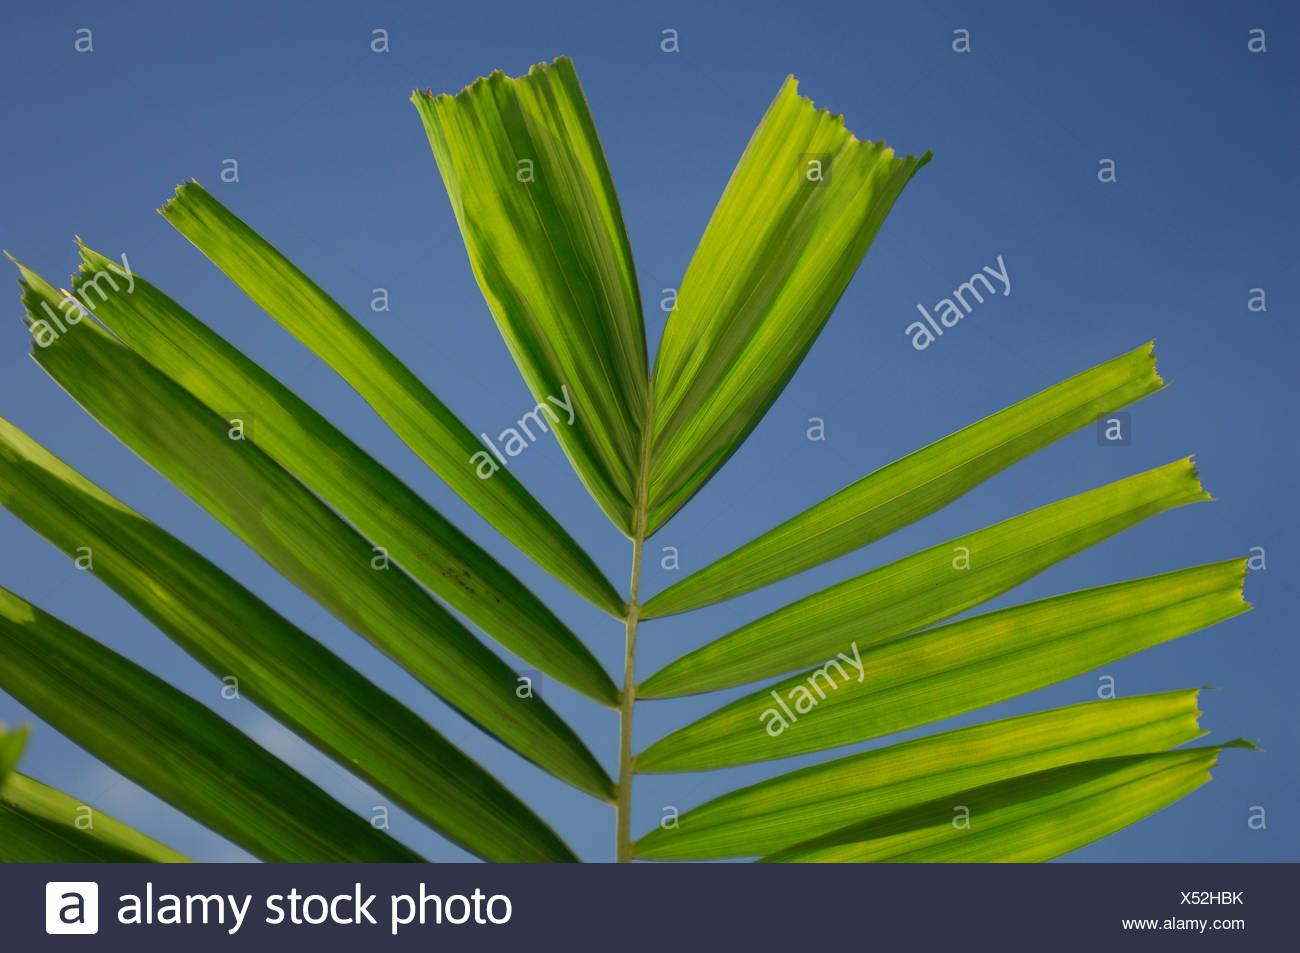 Caribbean Vauxhall Barbados Almond Beach Club & Spa Hotel West Coast Palm Palms Leaves Leaf Leafs Detail Close-Up Green Blue - Stock Image